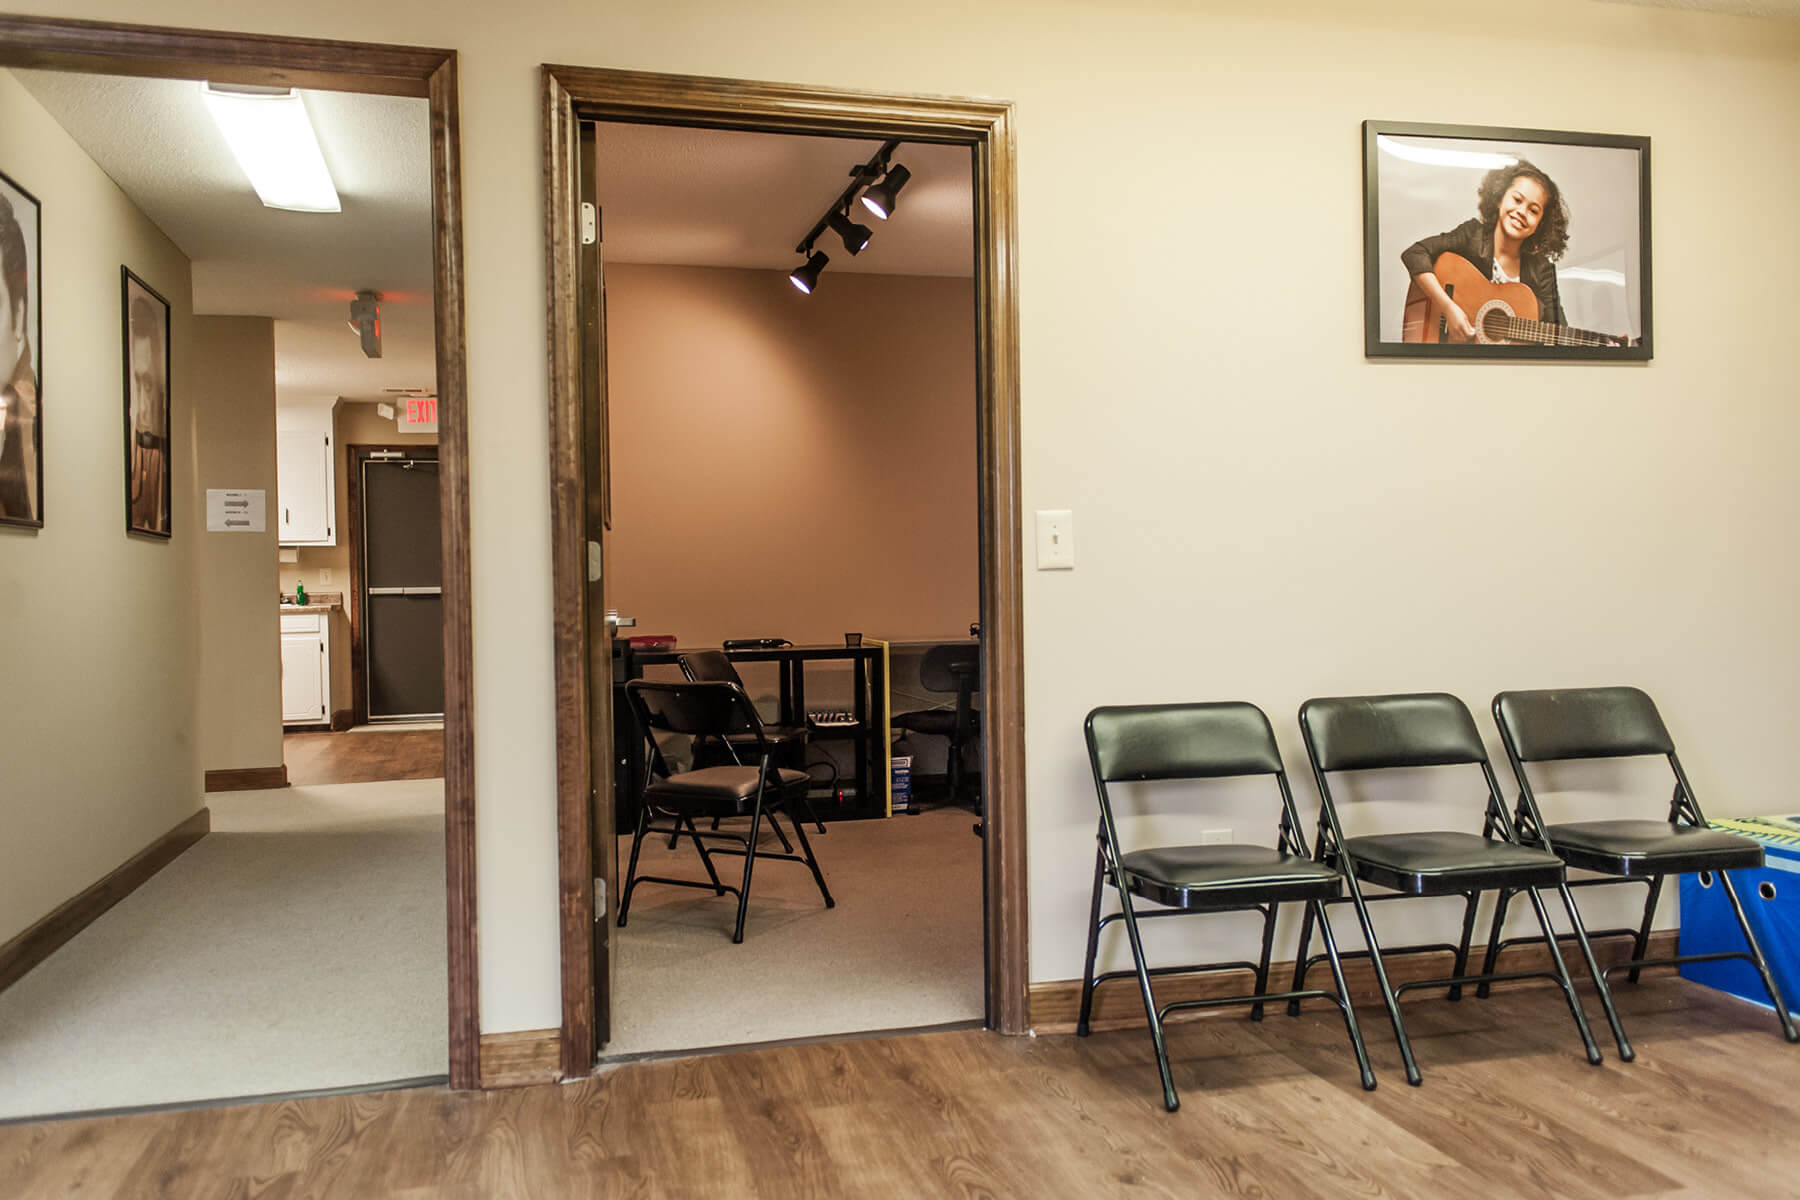 Lexington School of Music office waiting area